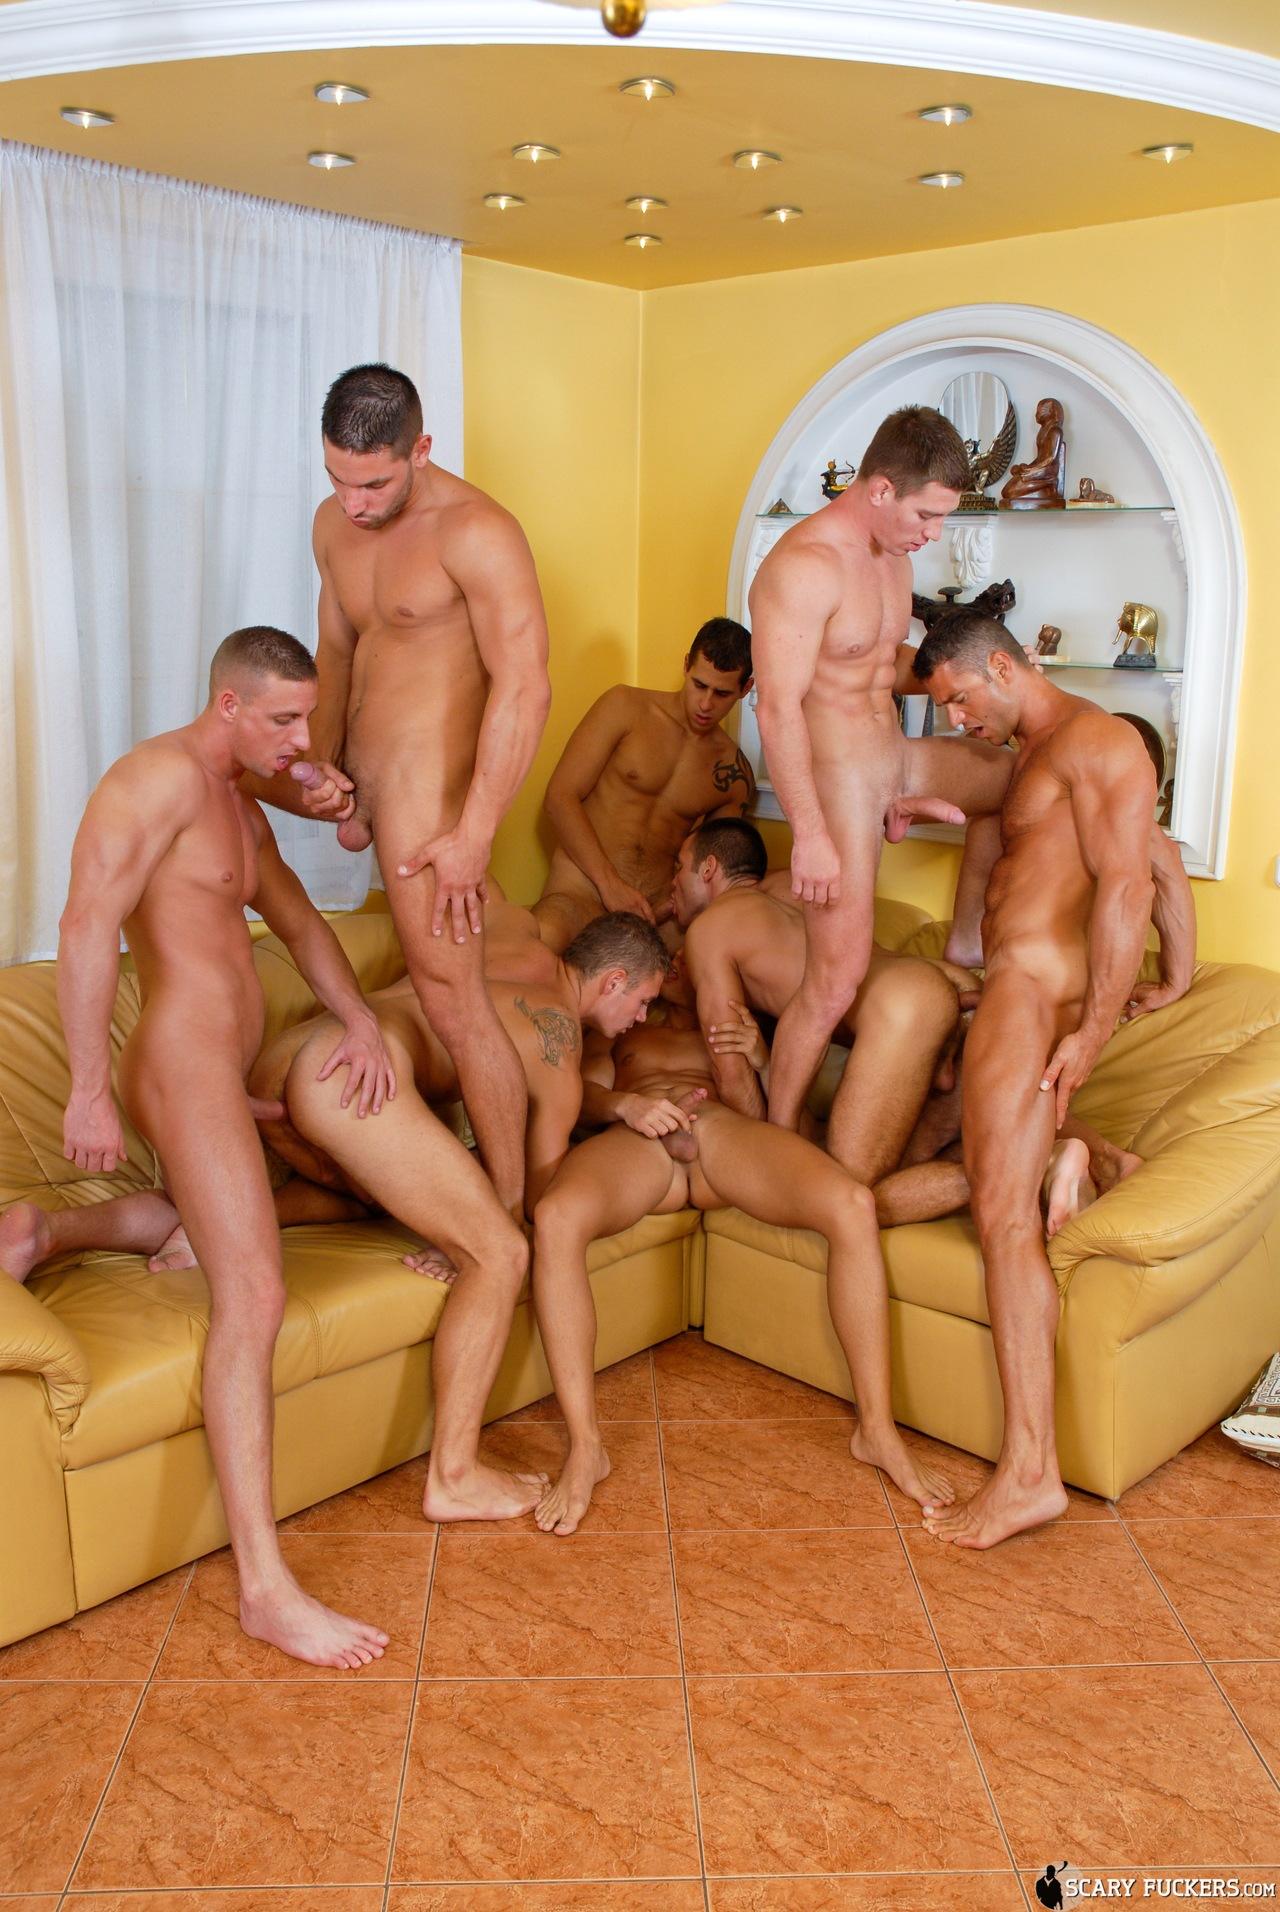 bisexual gangbang pics - porn clips